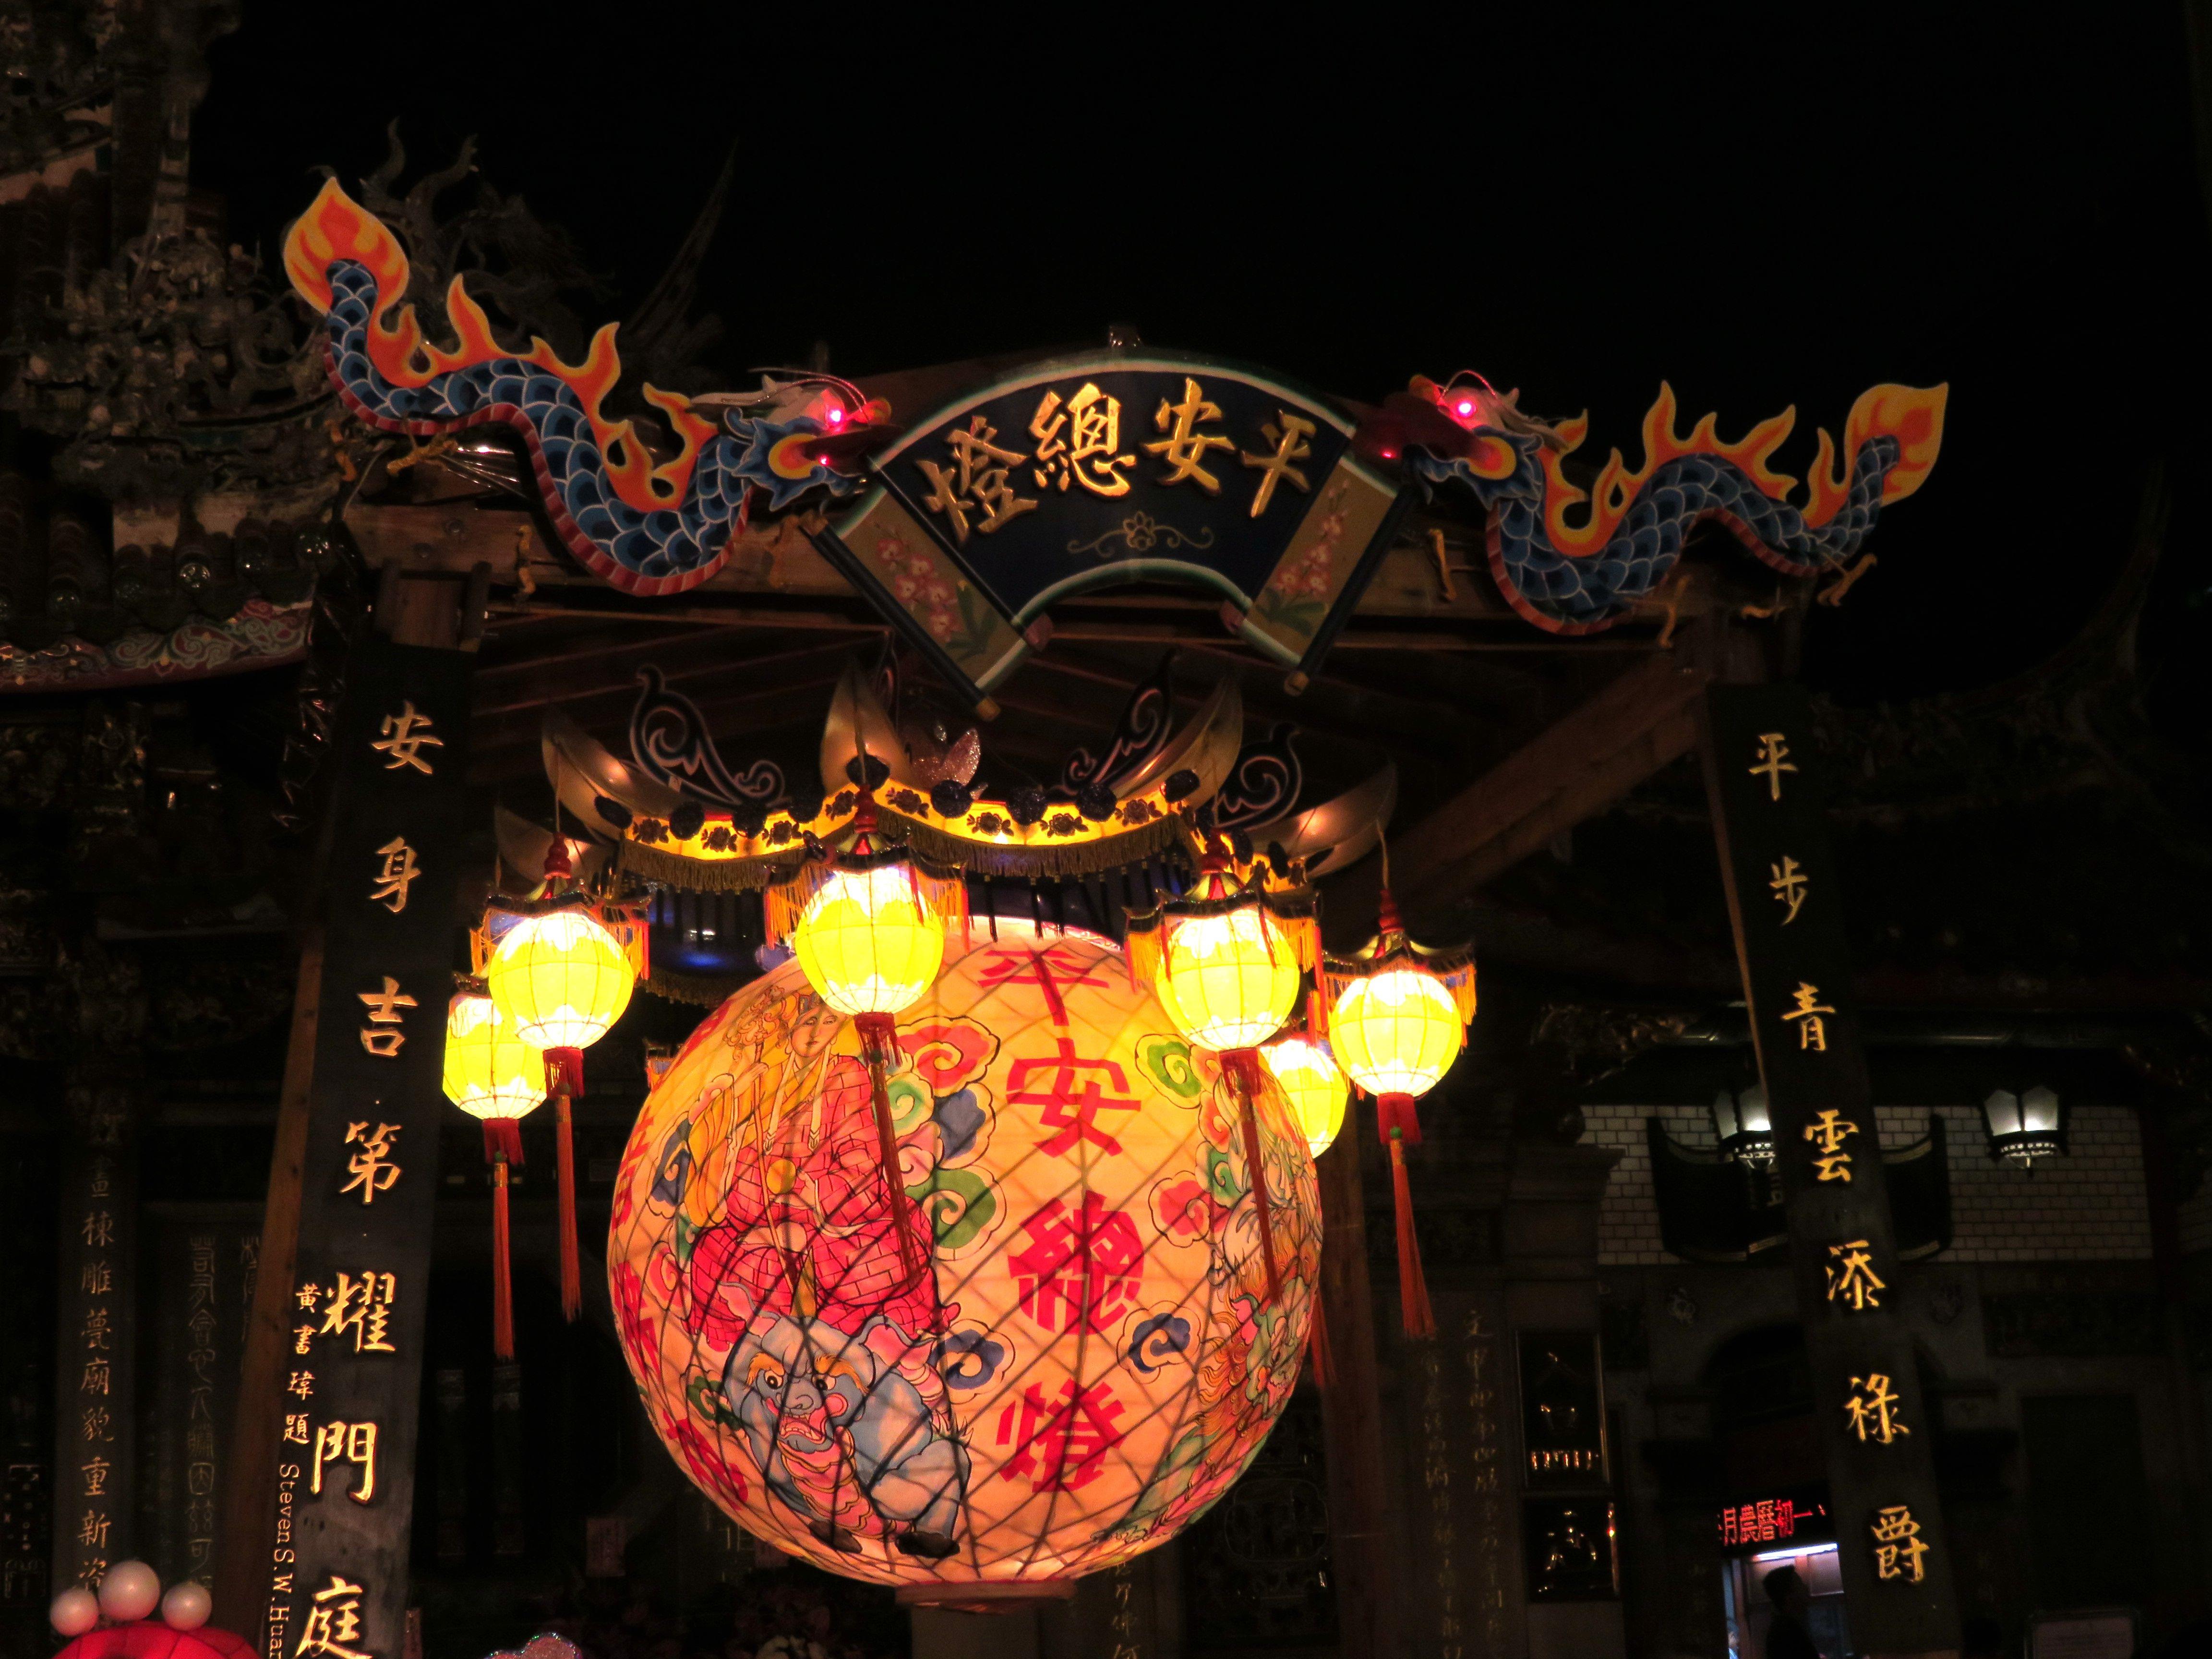 night amusement park christmas mid autumn festival chinese new year lantern festival the ram - Chinese New Year Lantern